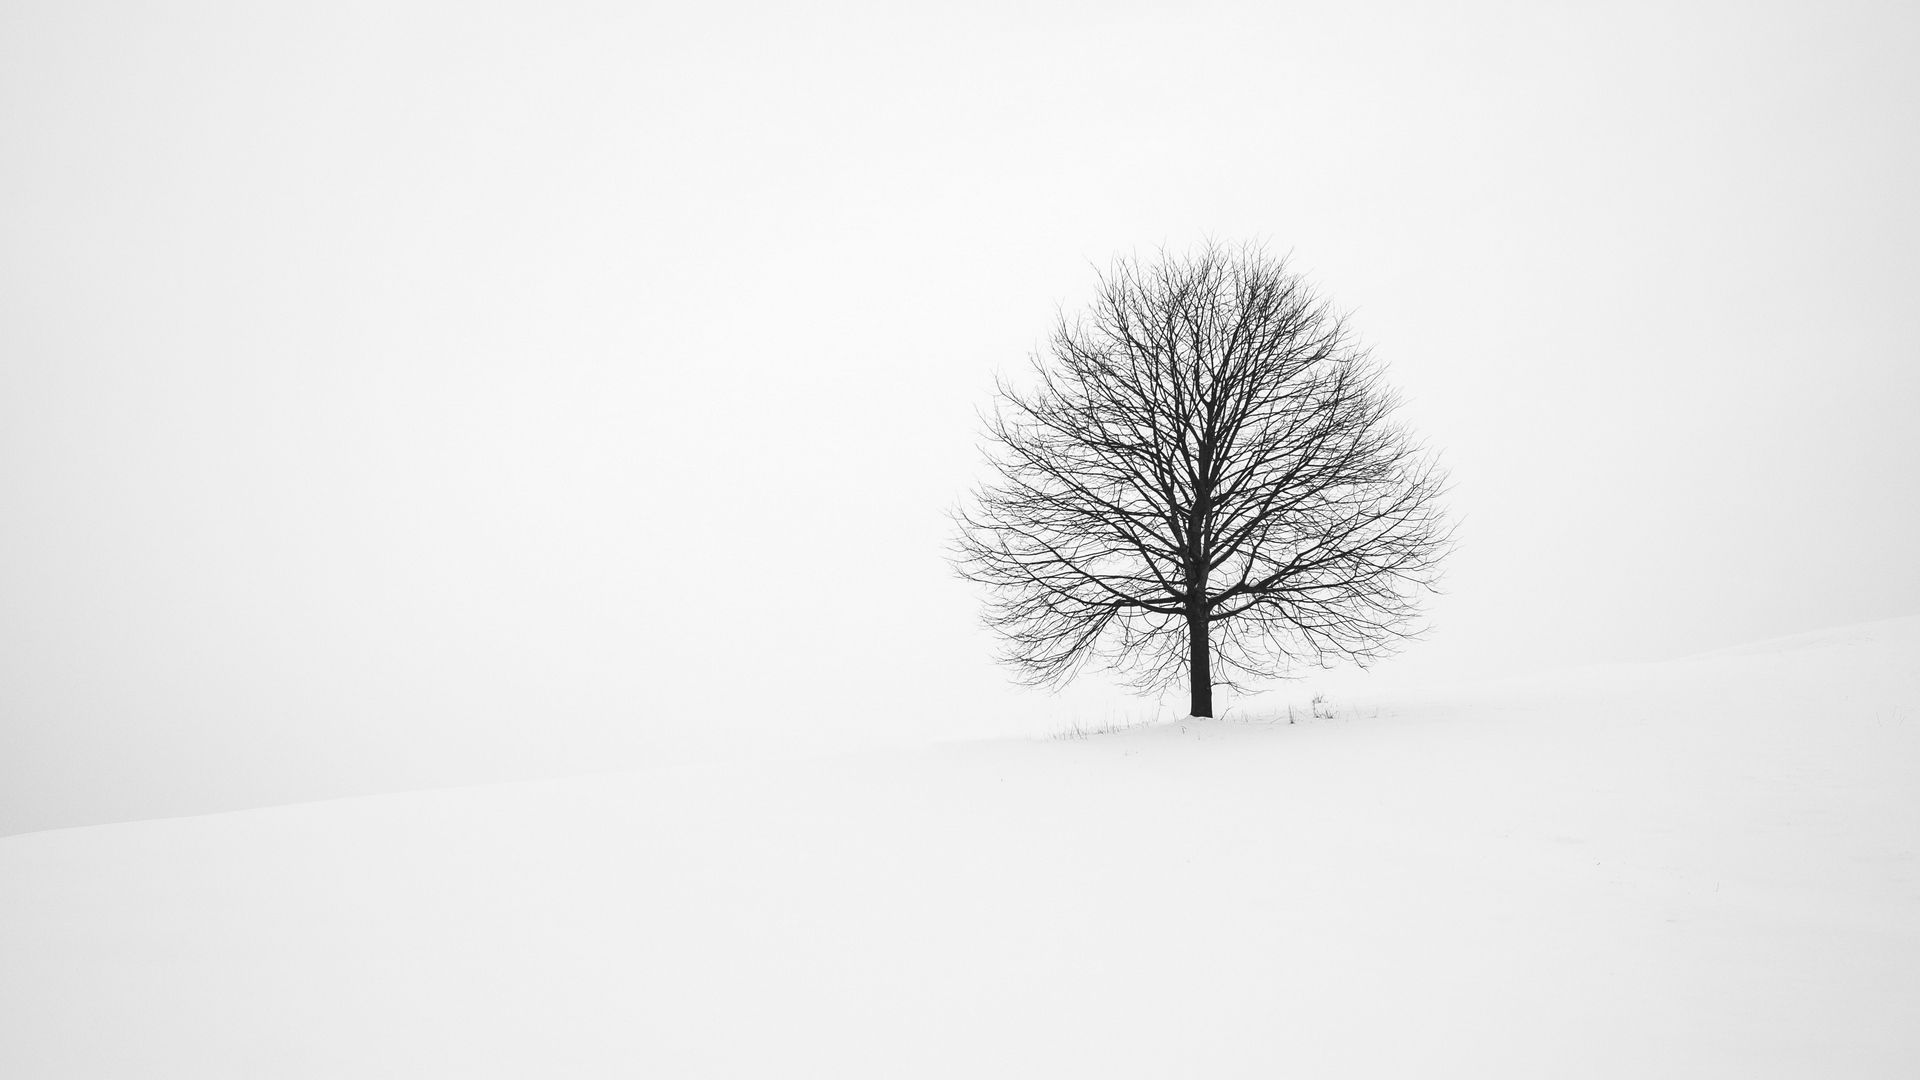 Snow Minimalist Wallpapers Top Free Snow Minimalist